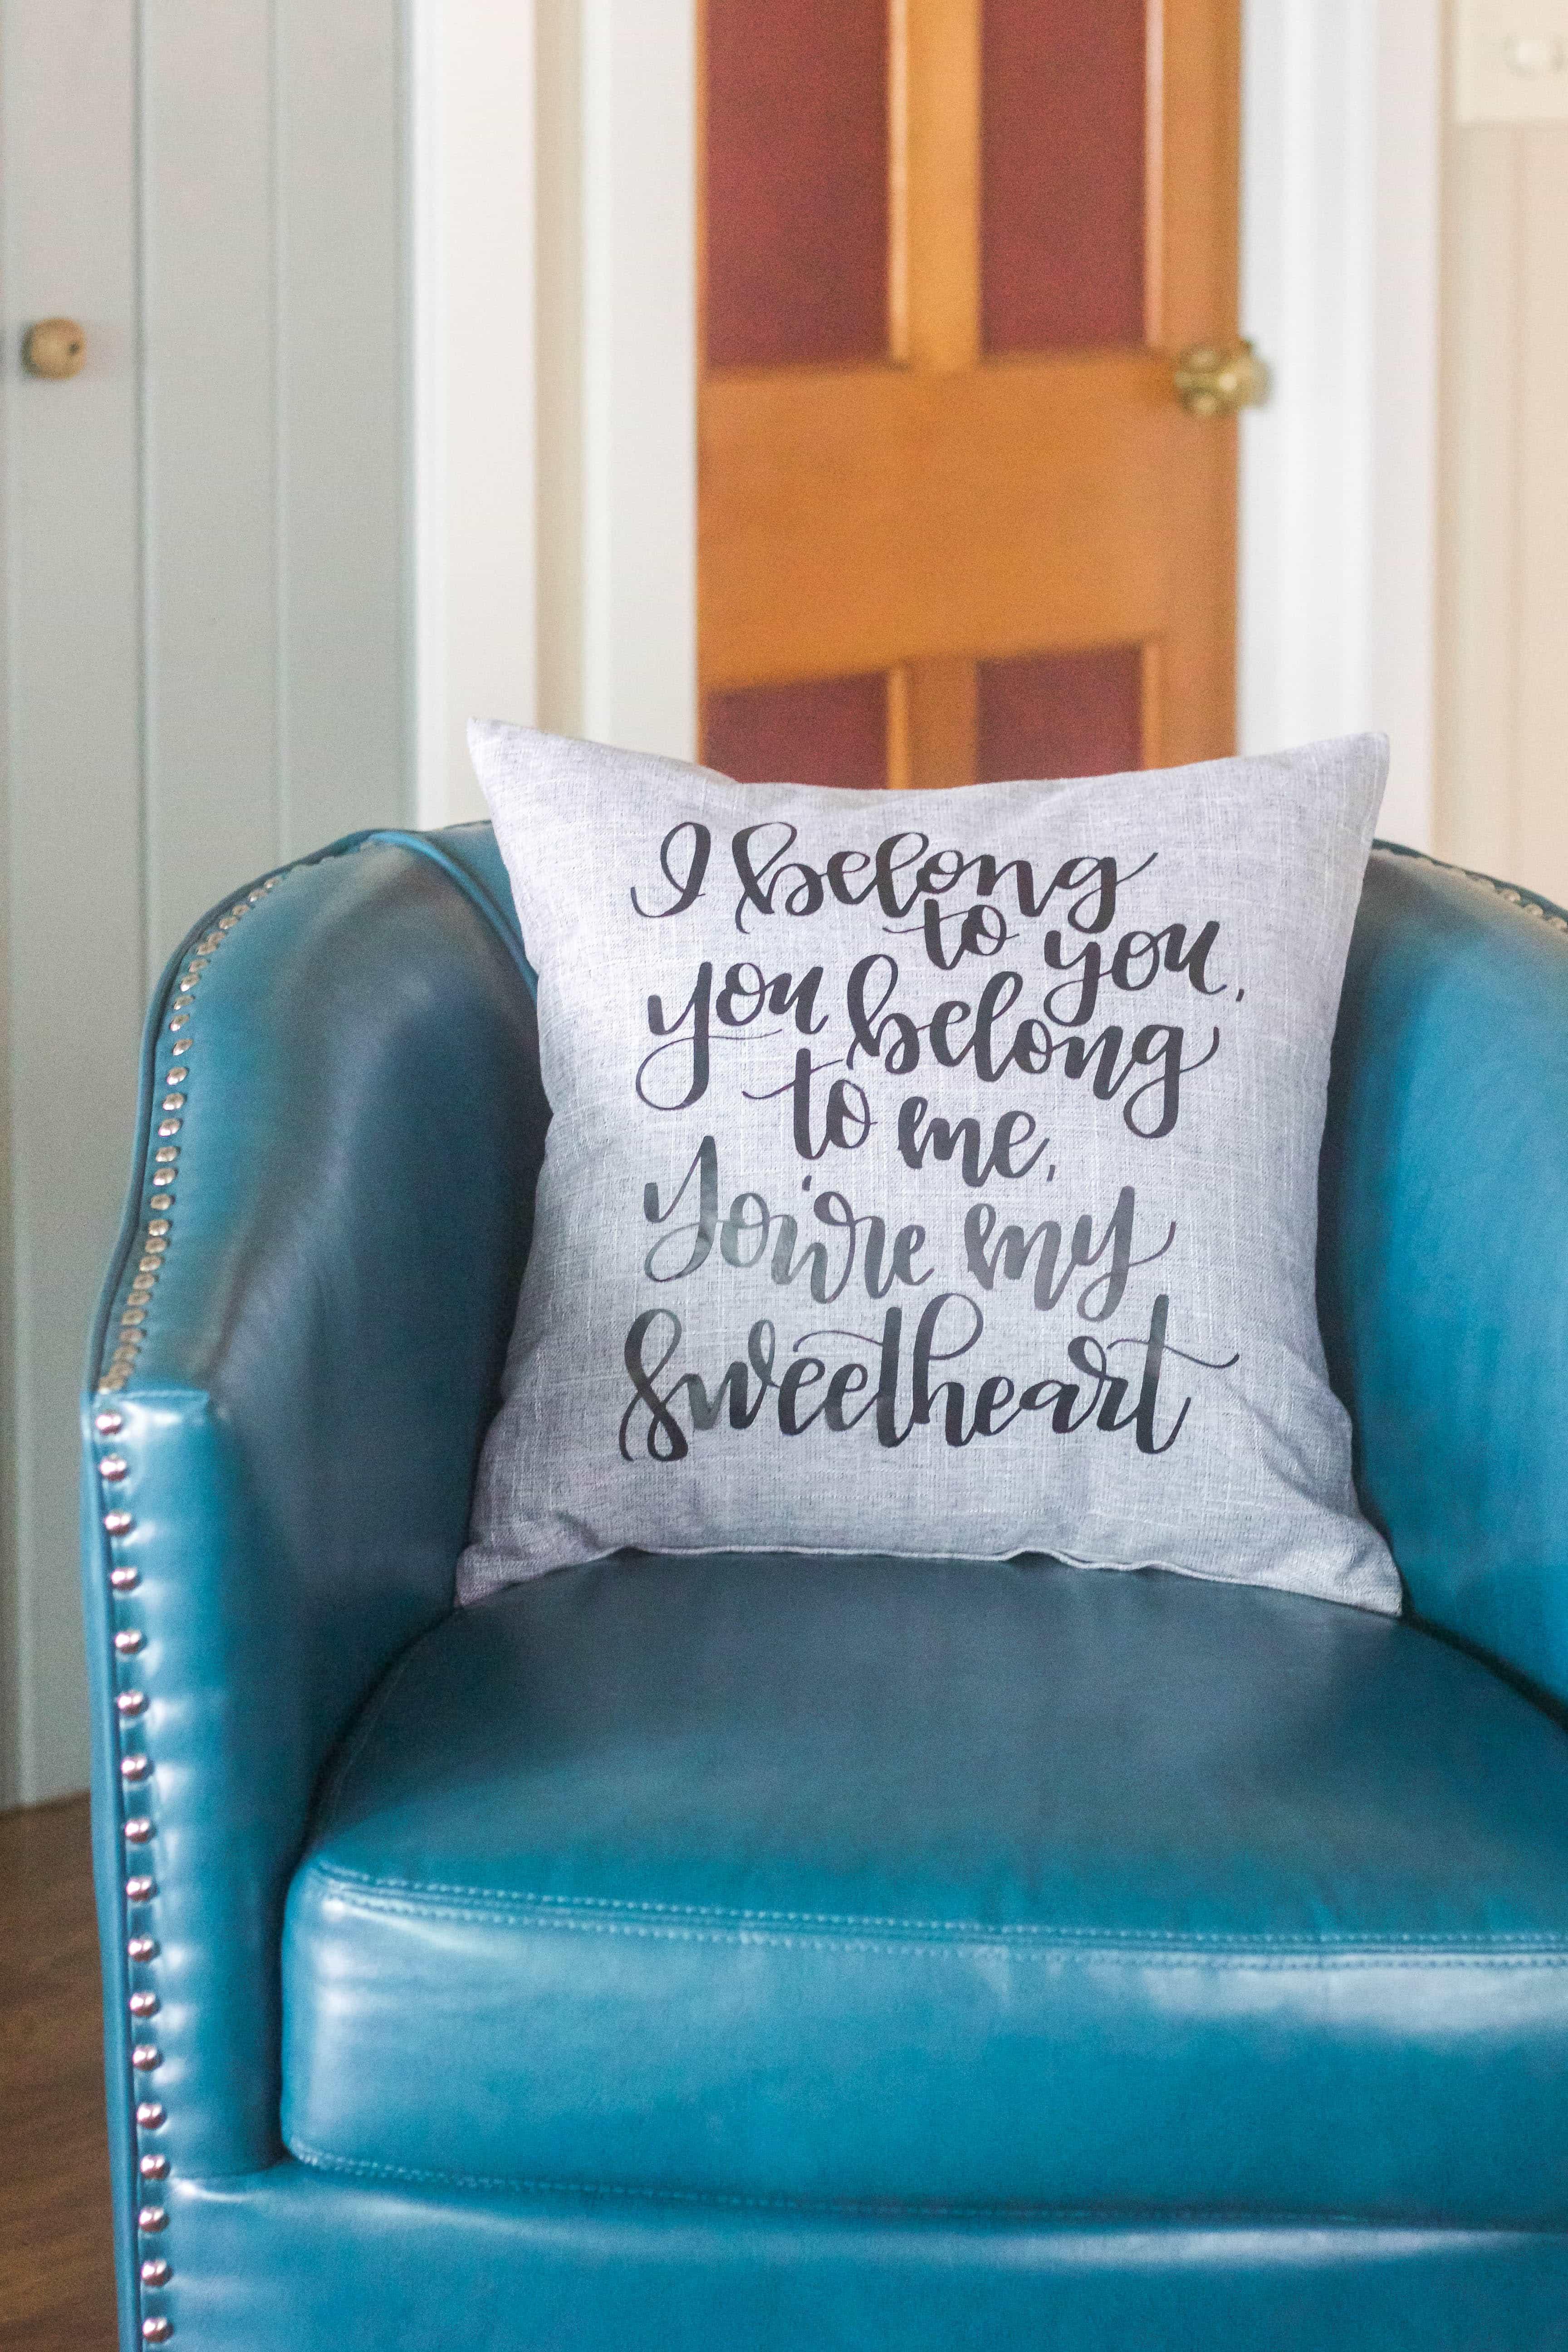 I Belong To You Pillow - www.refashionablylate.com